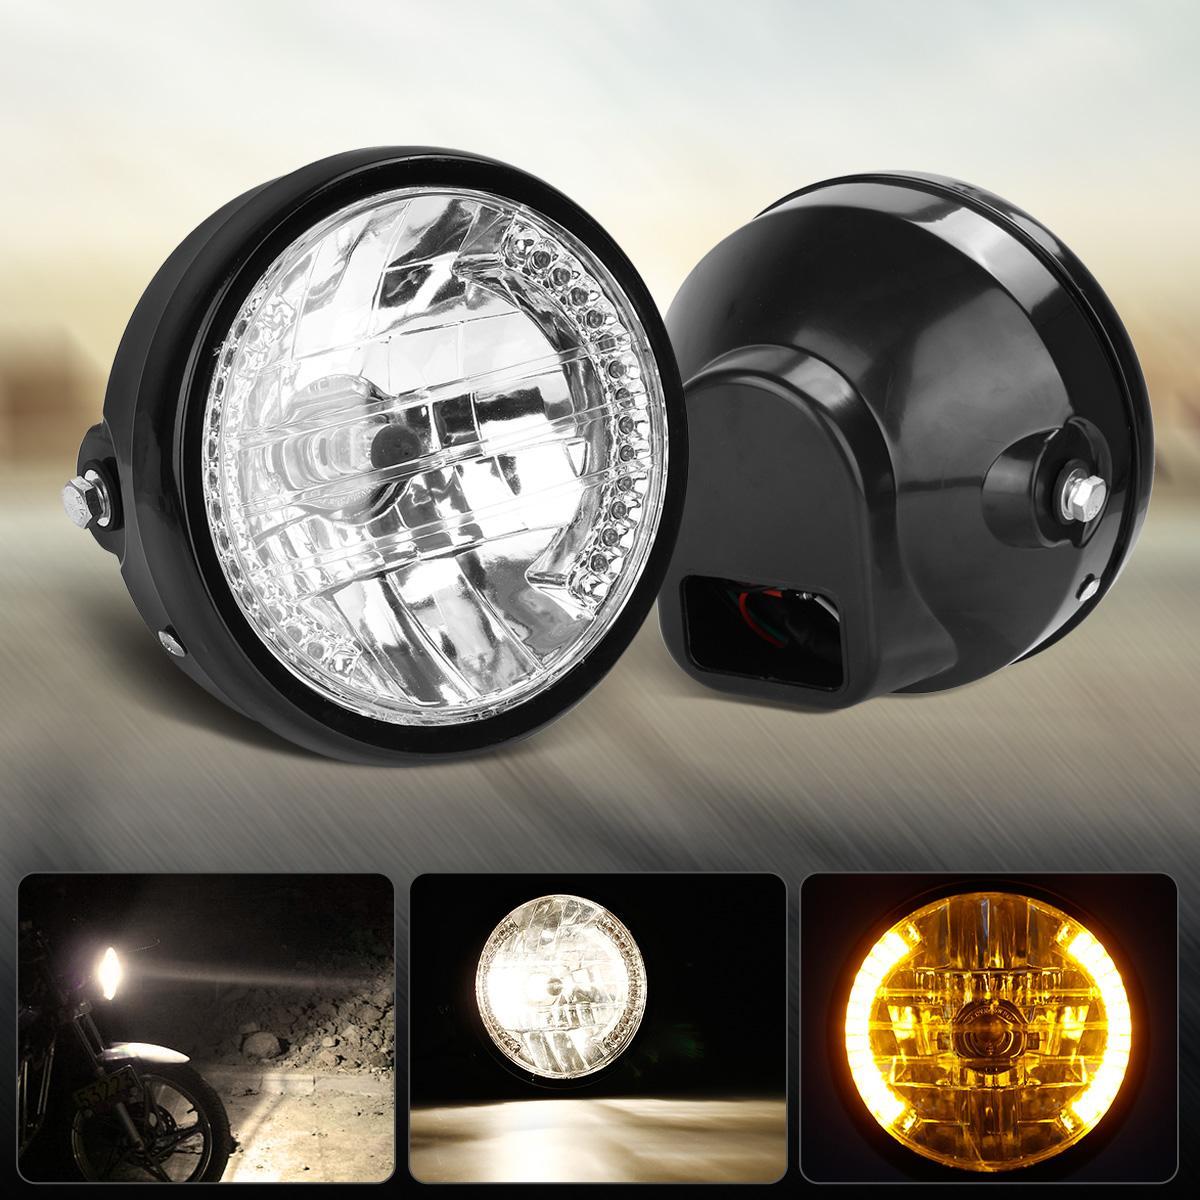 2005 2009 ford mustang 2x hid white 921 led reverse light bulb backup - 7 Black Halogen Motorcycle Headlight Amber Led Angel Eye Turn Signal Head Light